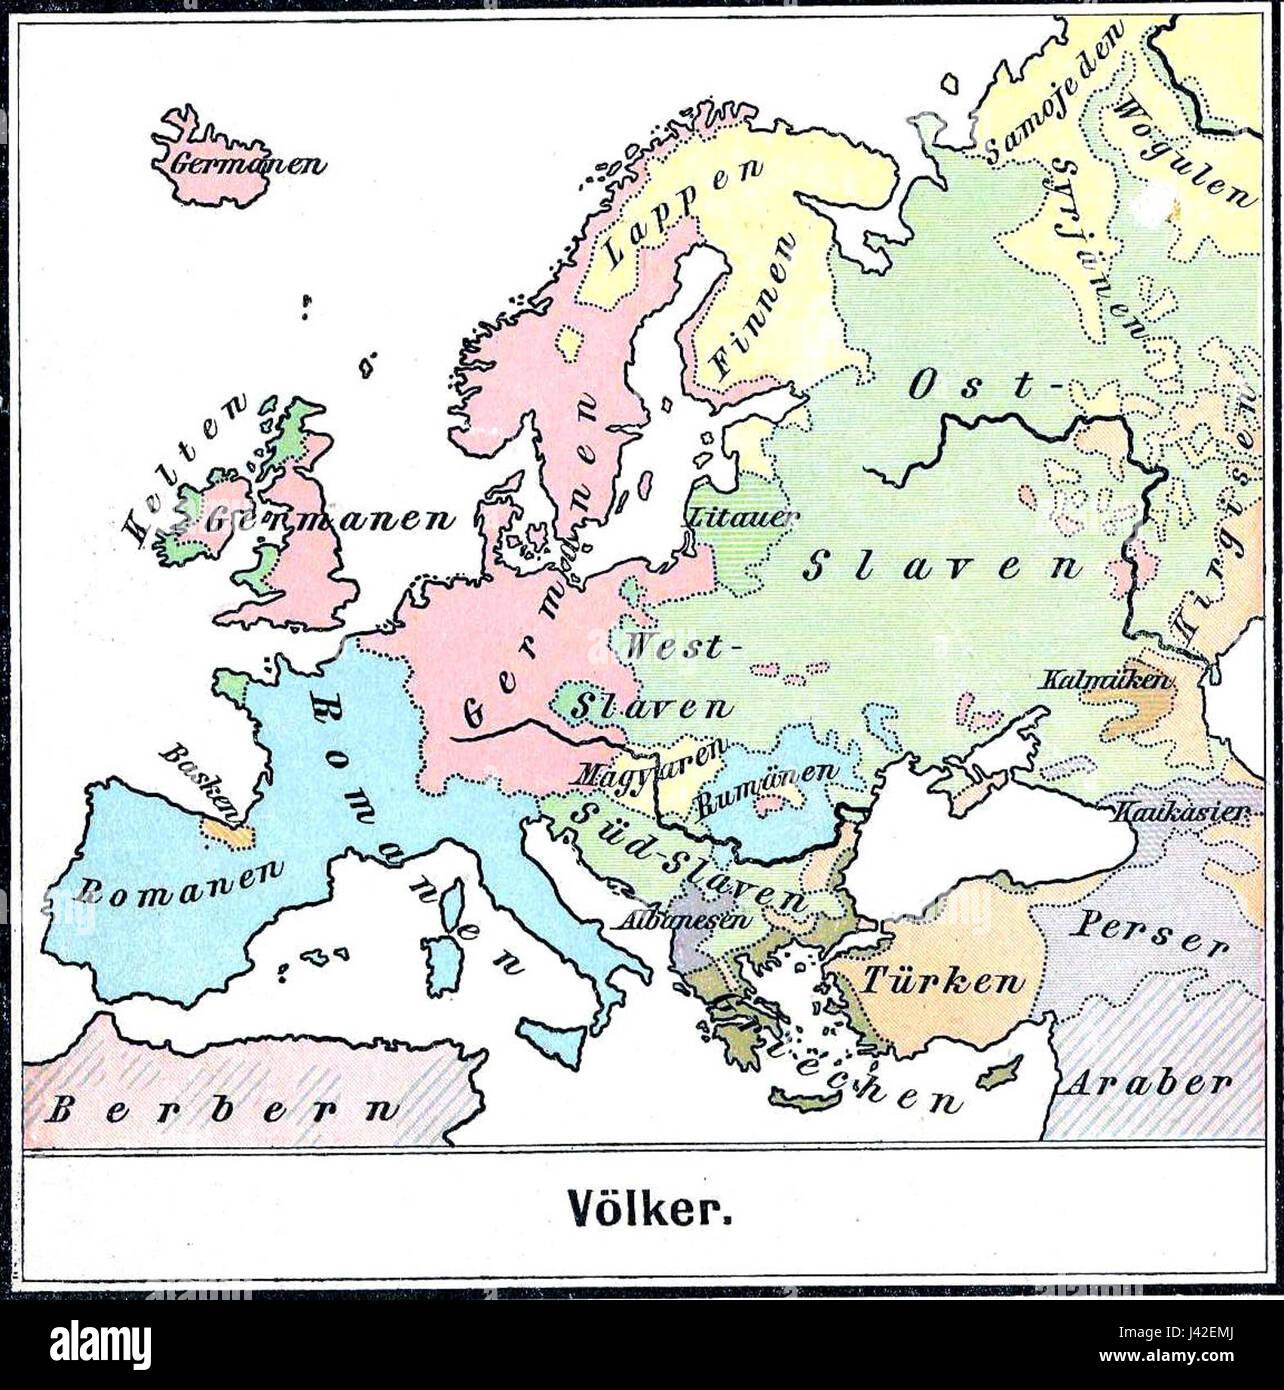 Main ethnic groups in Europe (1899 Stock Photo: 140197026 - Alamy